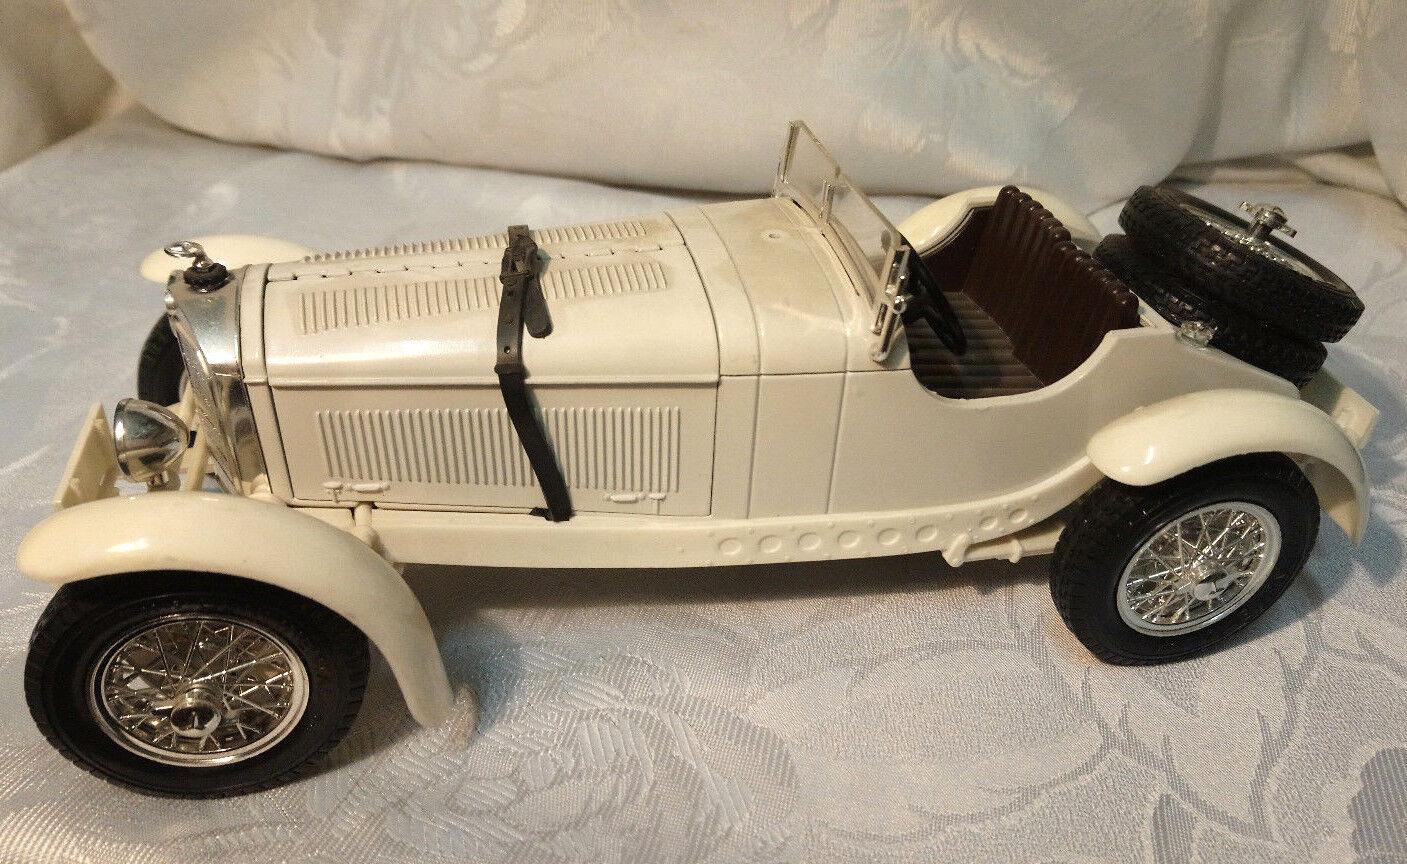 BURAGO modello di auto 1 18 MERCEDES-BENZ SSKL 1931 MADE IN ITALY